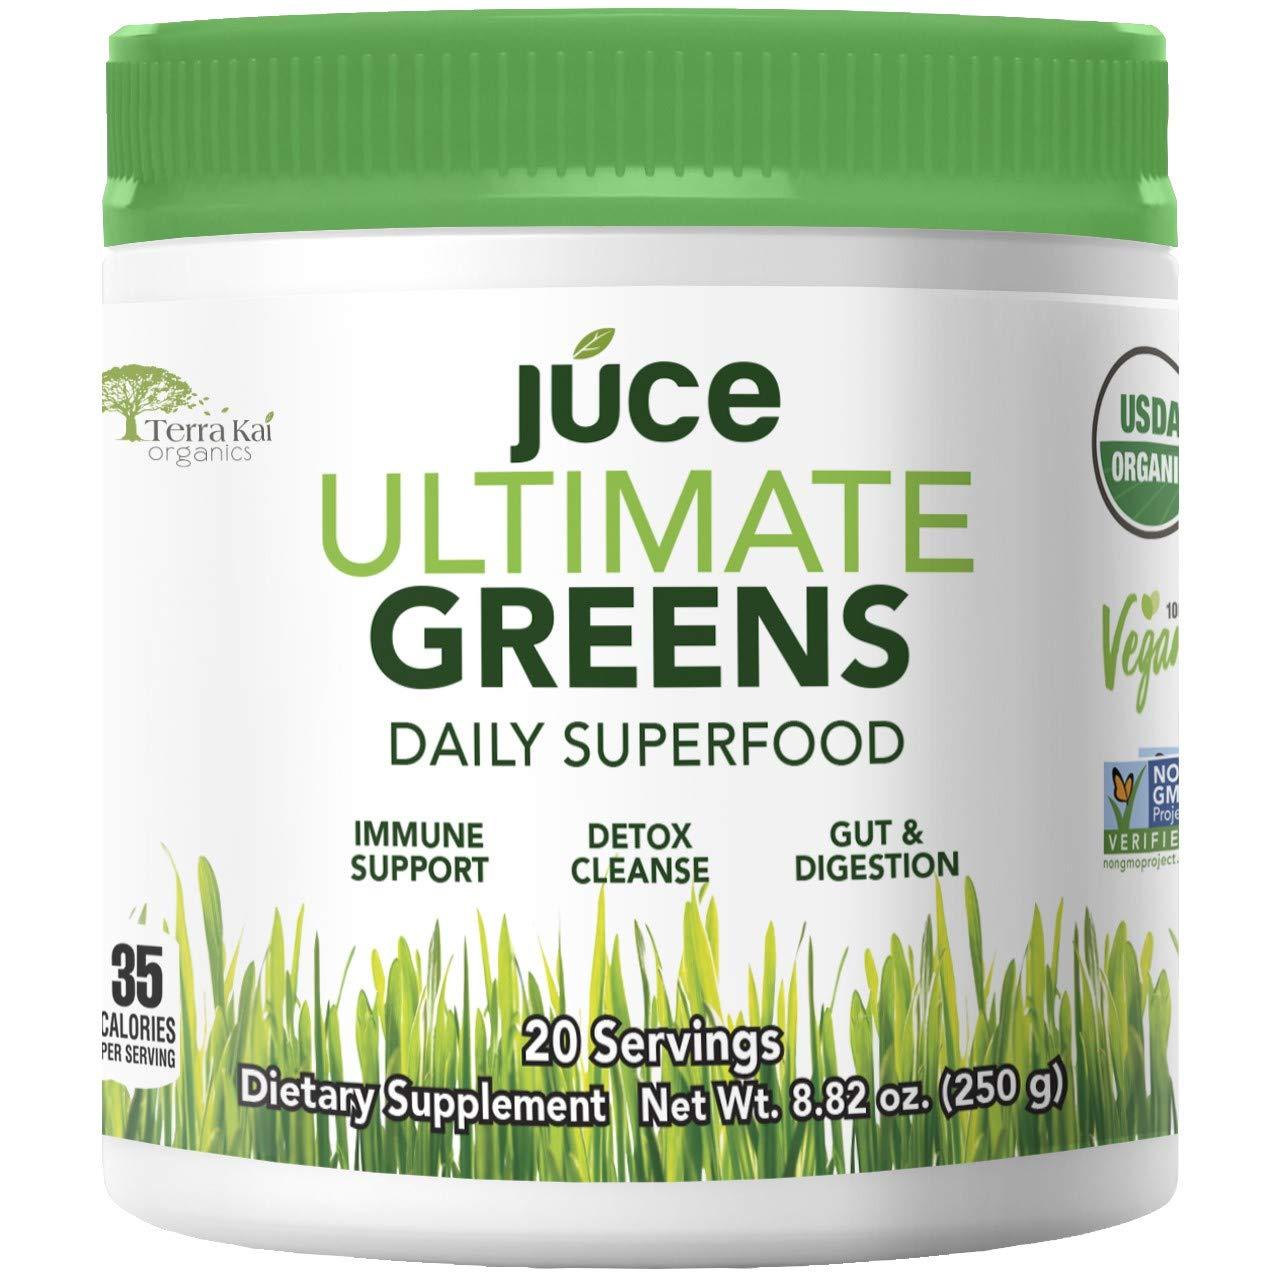 Terra Kai Organics JUCE Greens Superfood Drink Mix, Harvest Apple, 8.82 Ounce